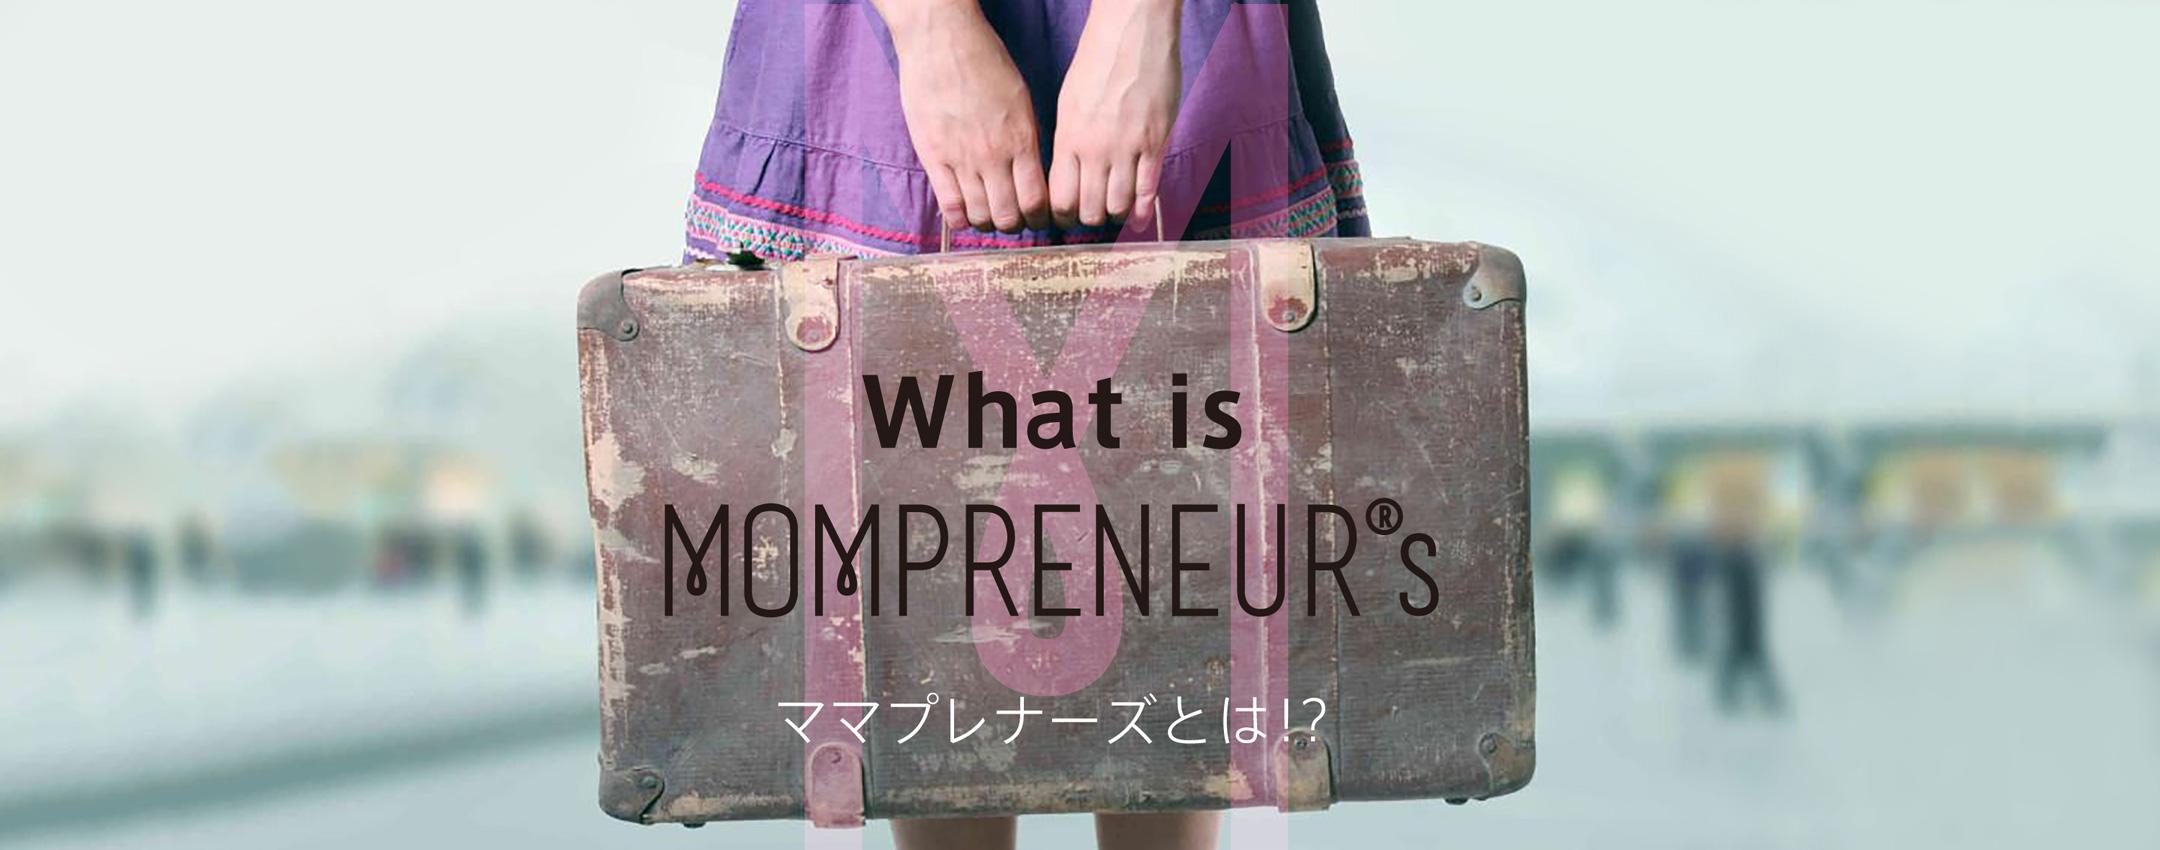 What is Mompreneurs?---ママプレナーズとは